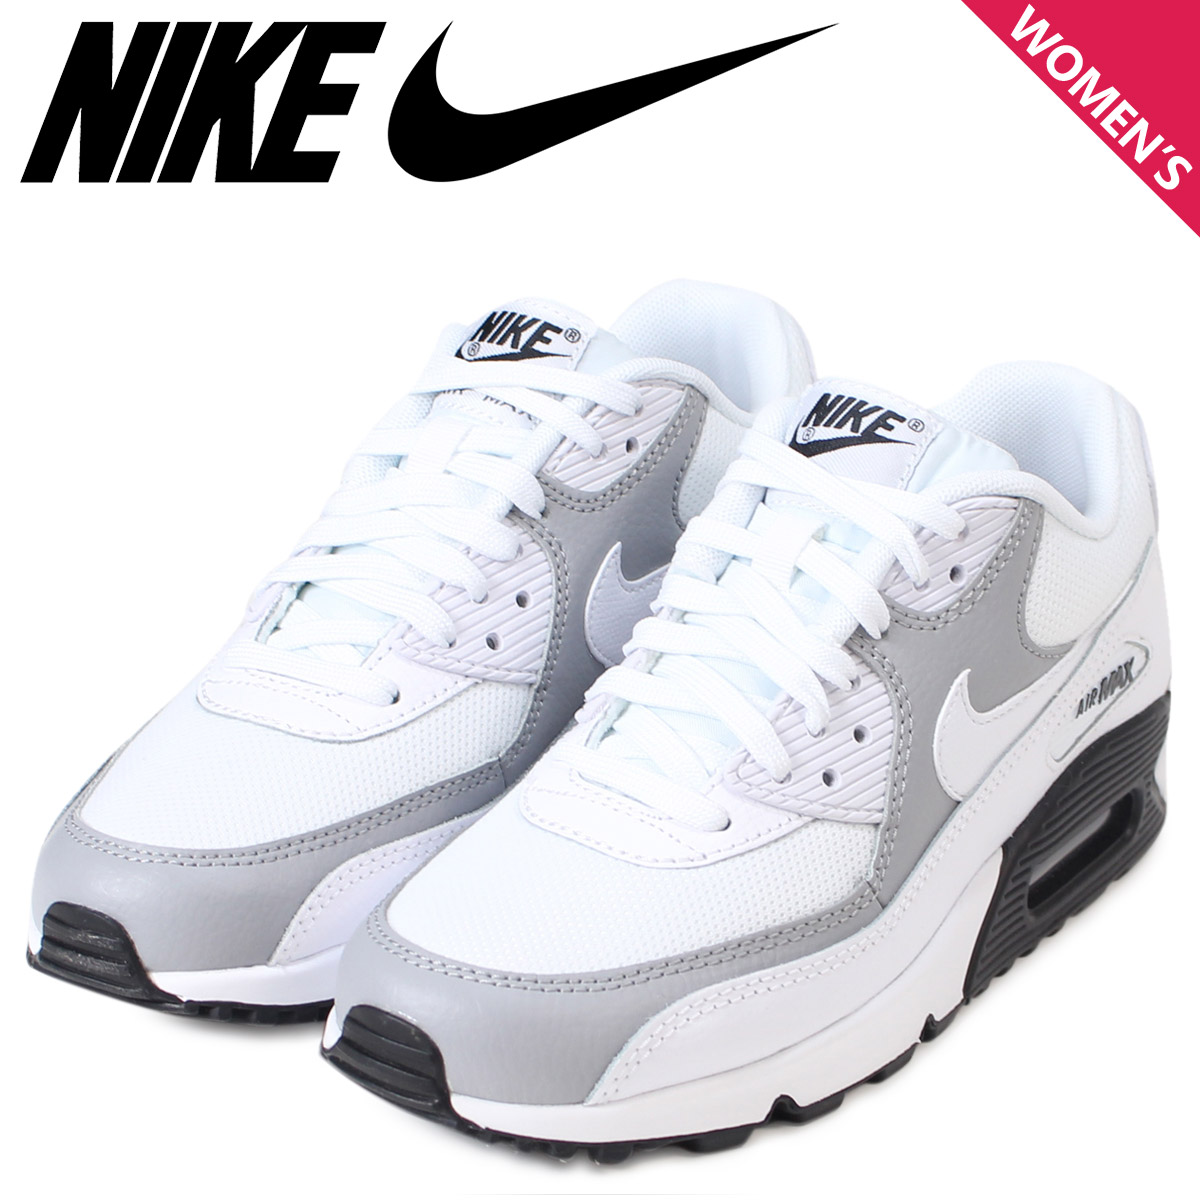 79e6d987c114 ALLSPORTS  Nike NIKE Air Max 90 Lady s sneakers WMNS AIR MAX 90 ...